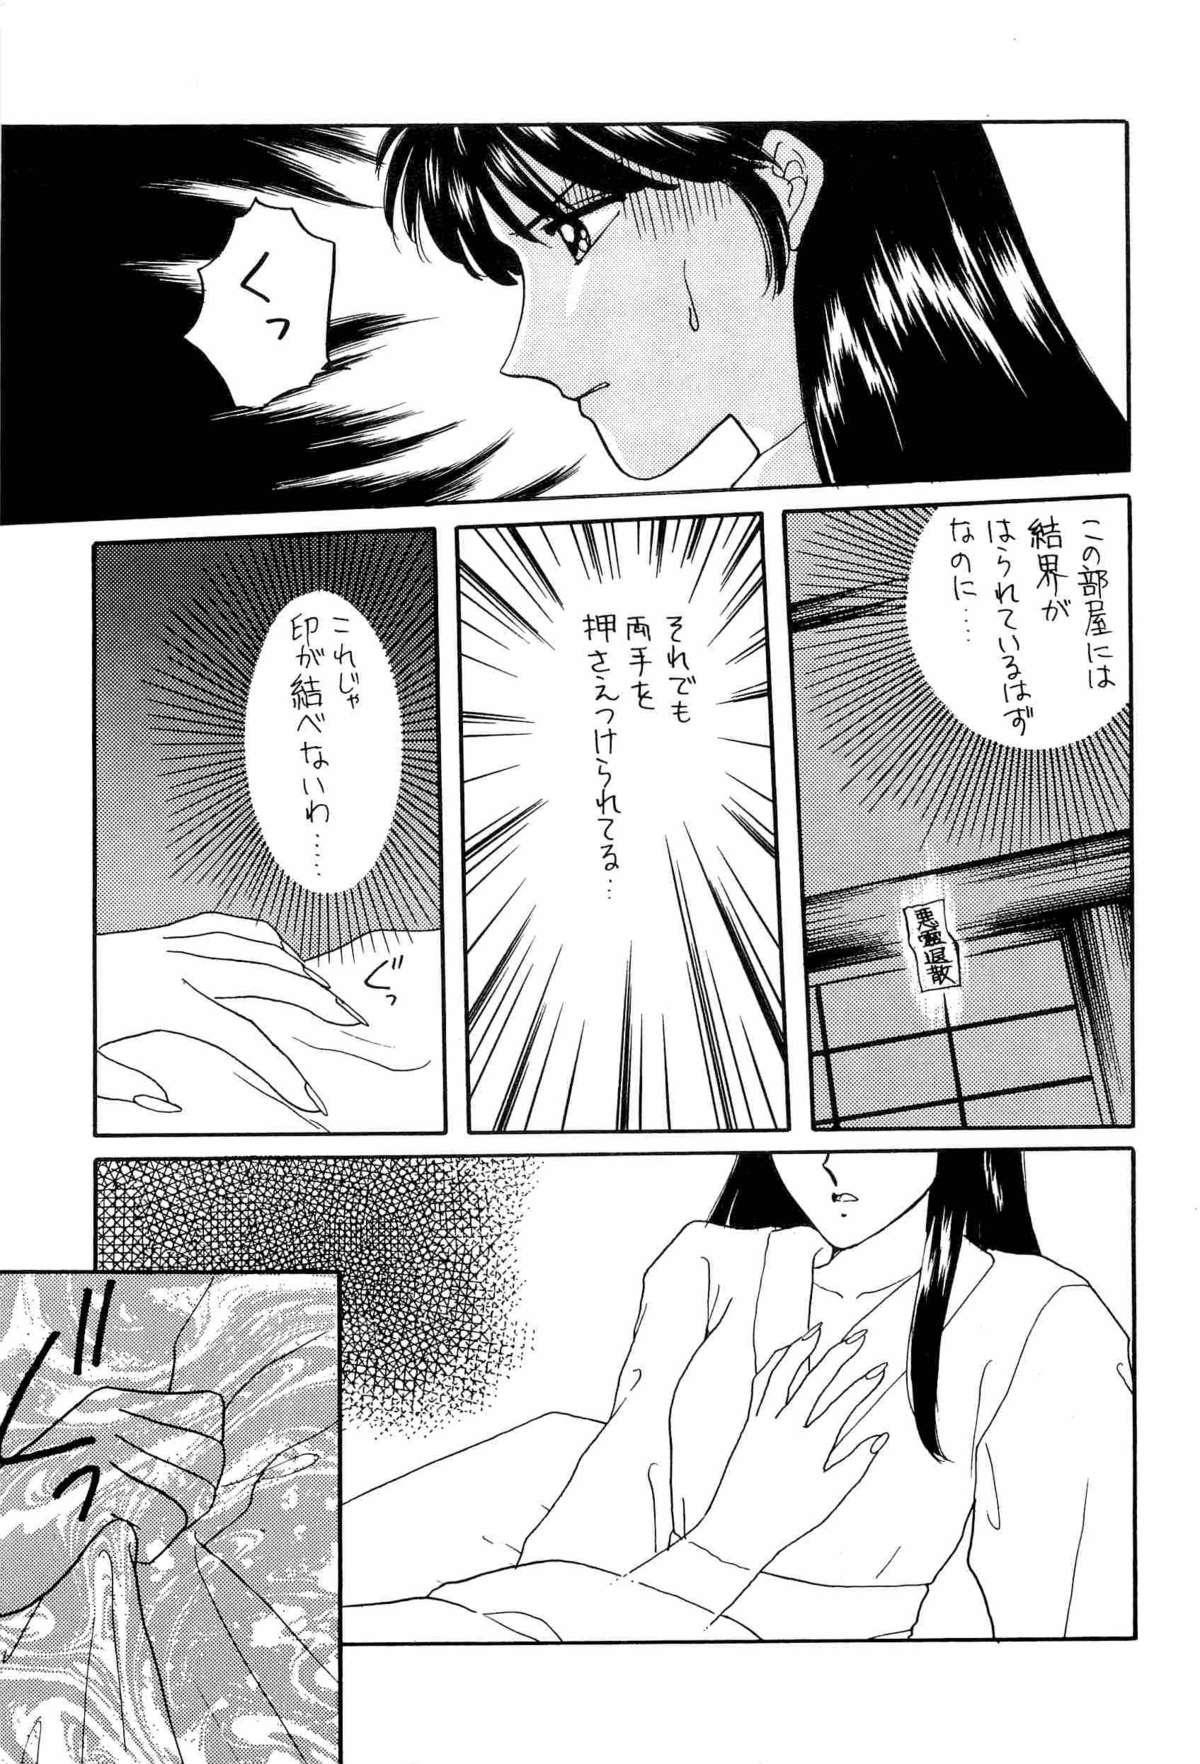 Bisyoujo Anthology '93 jyoukan 7